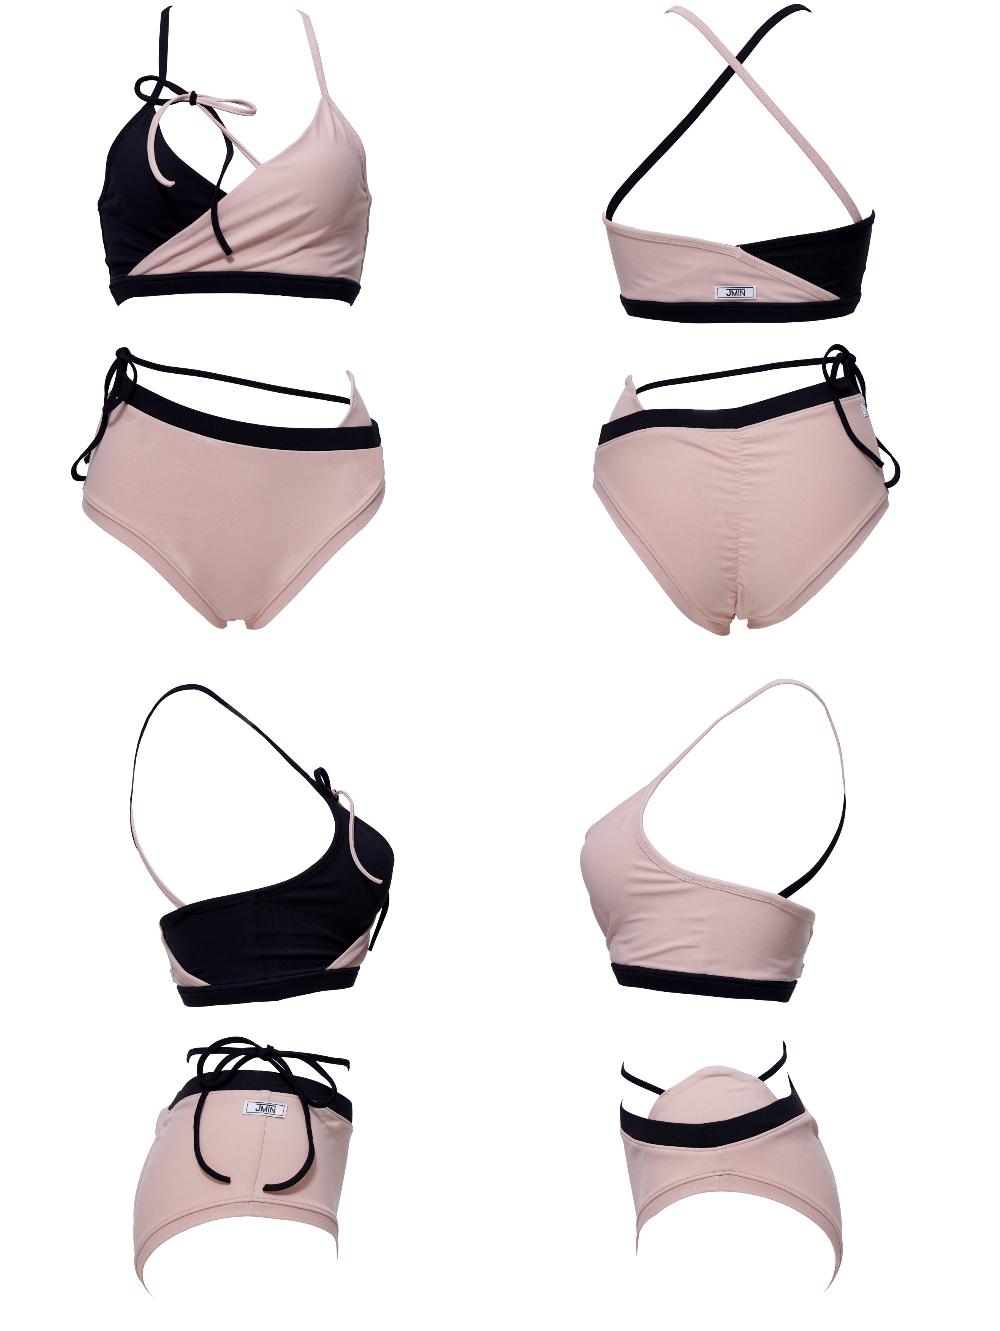 Swimwear/underwear baby pink color image-S1L22